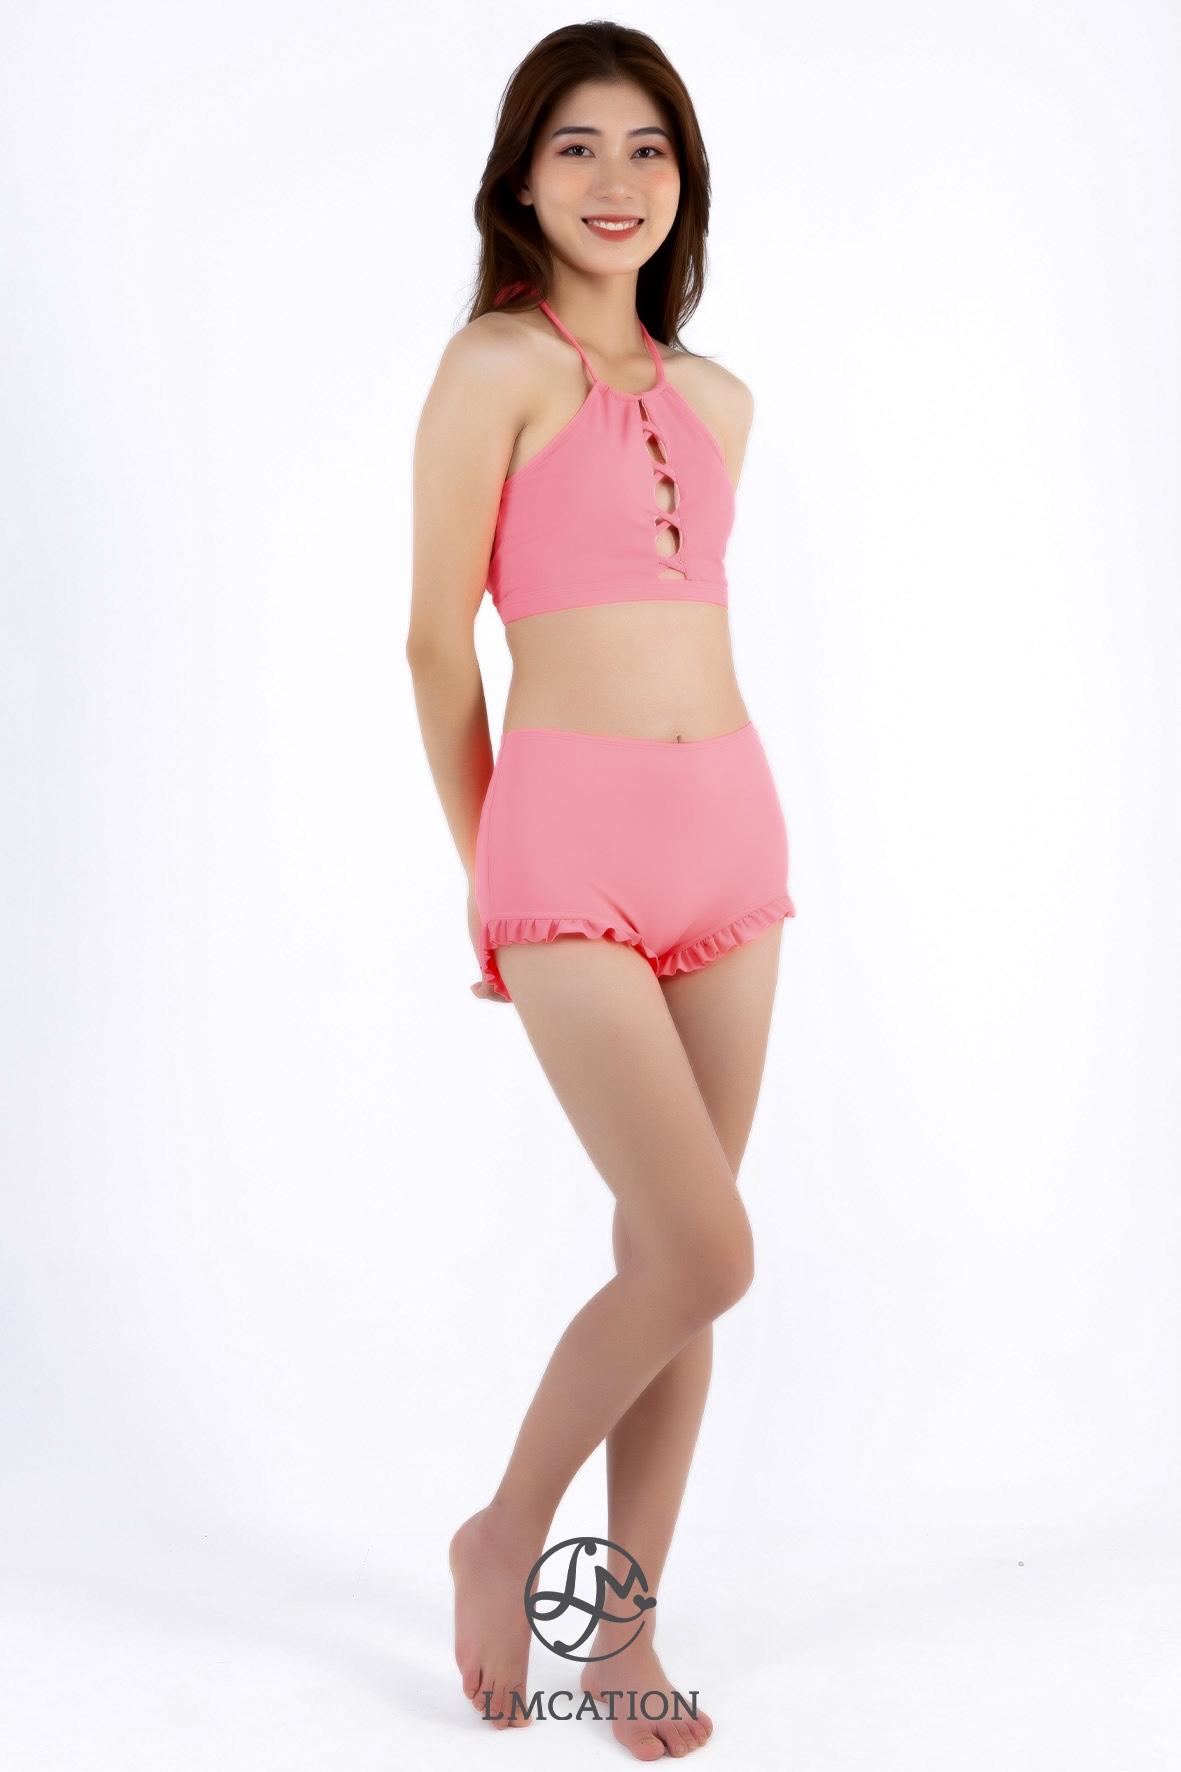 Bikini Combo - LMcation Lola Bikini Top & Estella Swim Shorts - Coral Pink